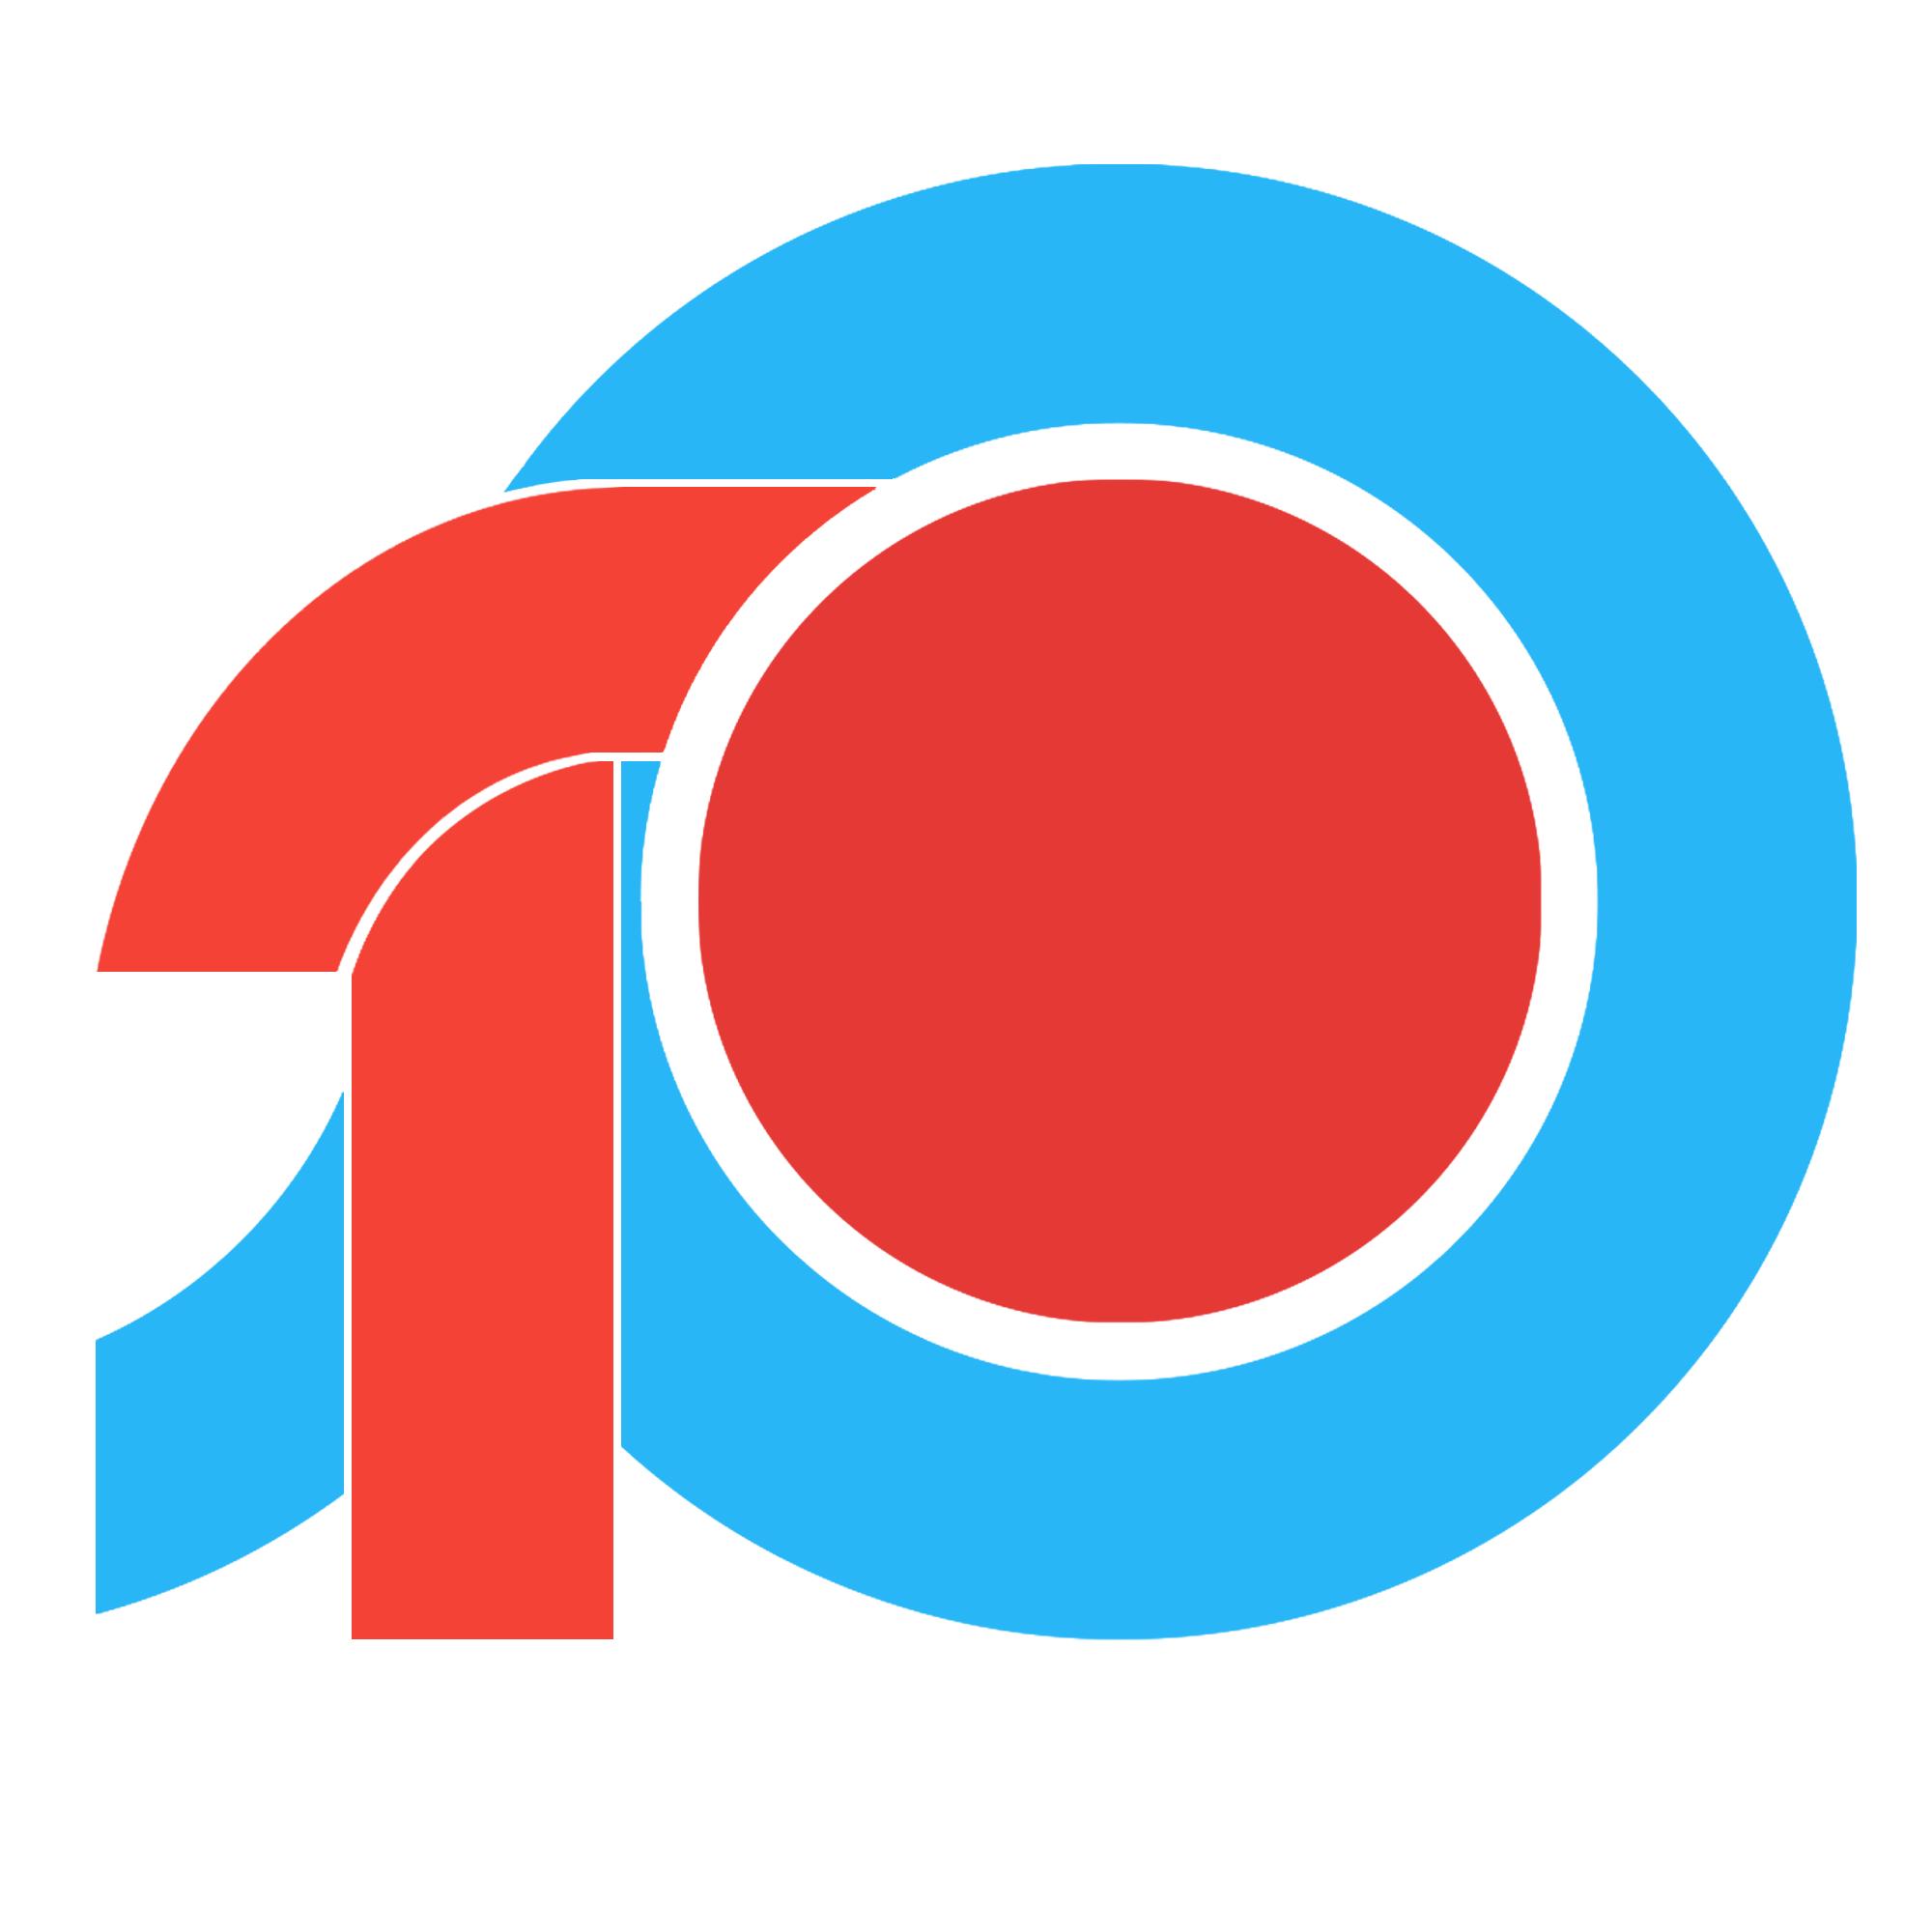 لوگو جدید وبسایت مقاله آی تی